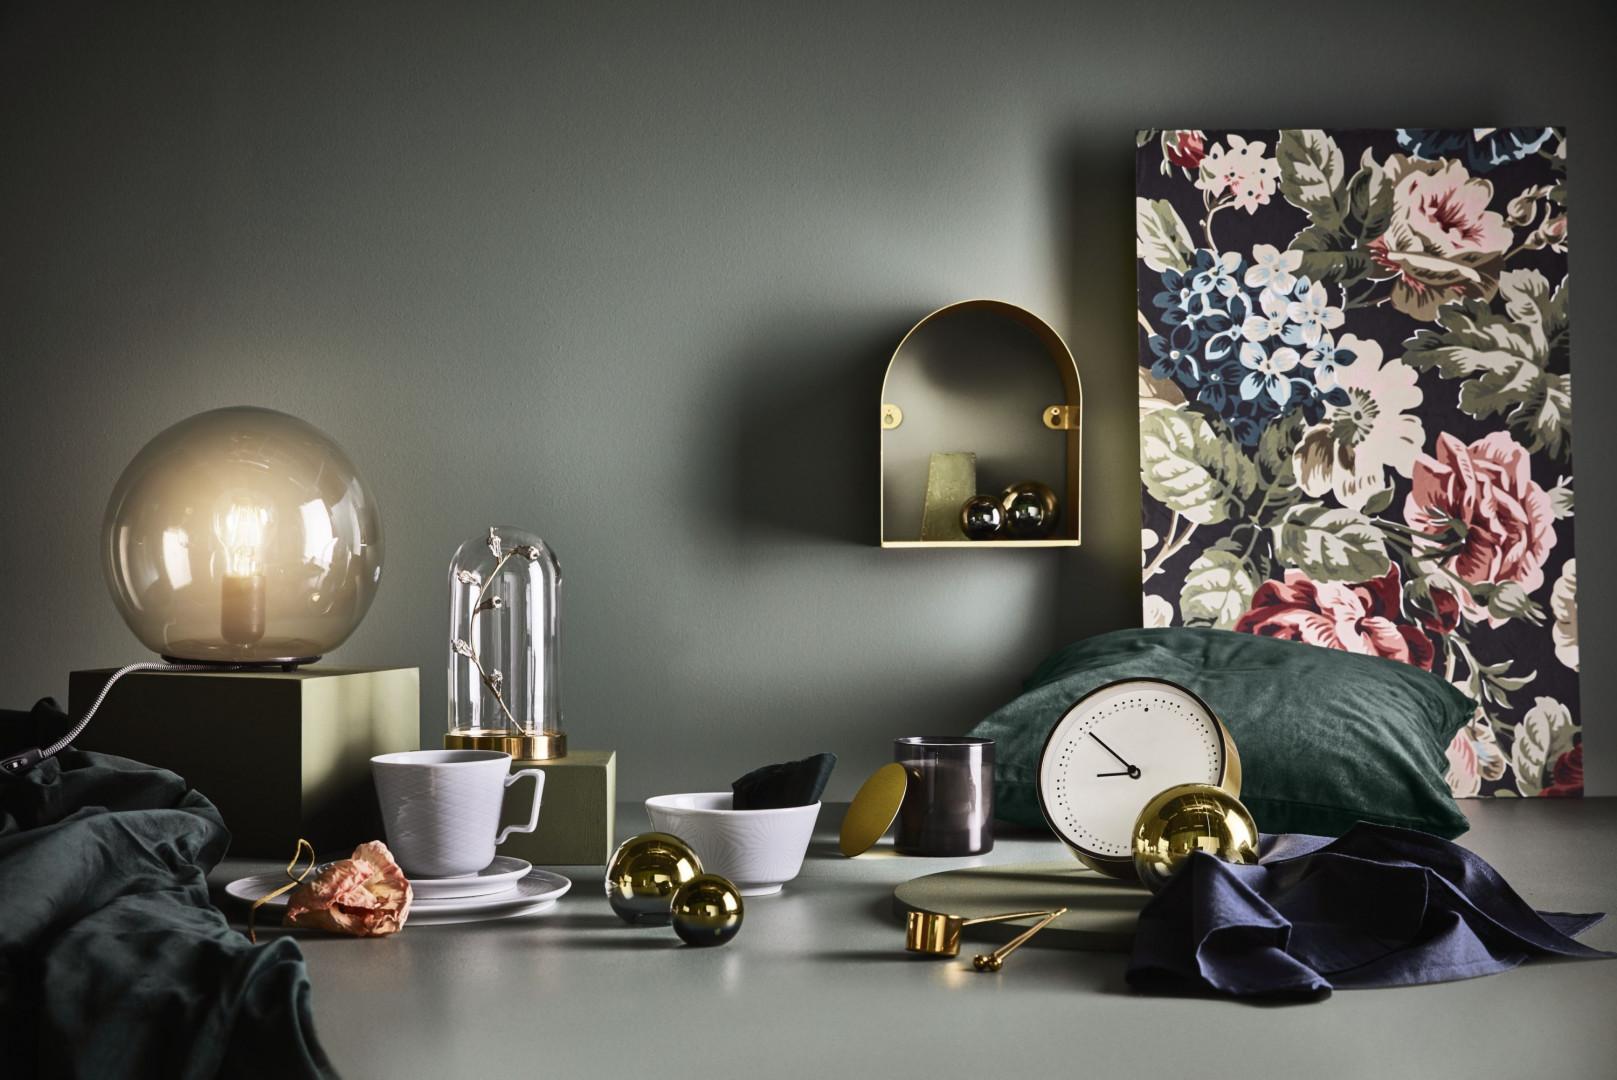 Półka ścienna z katalogu IKEA 2019. Fot. IKEA